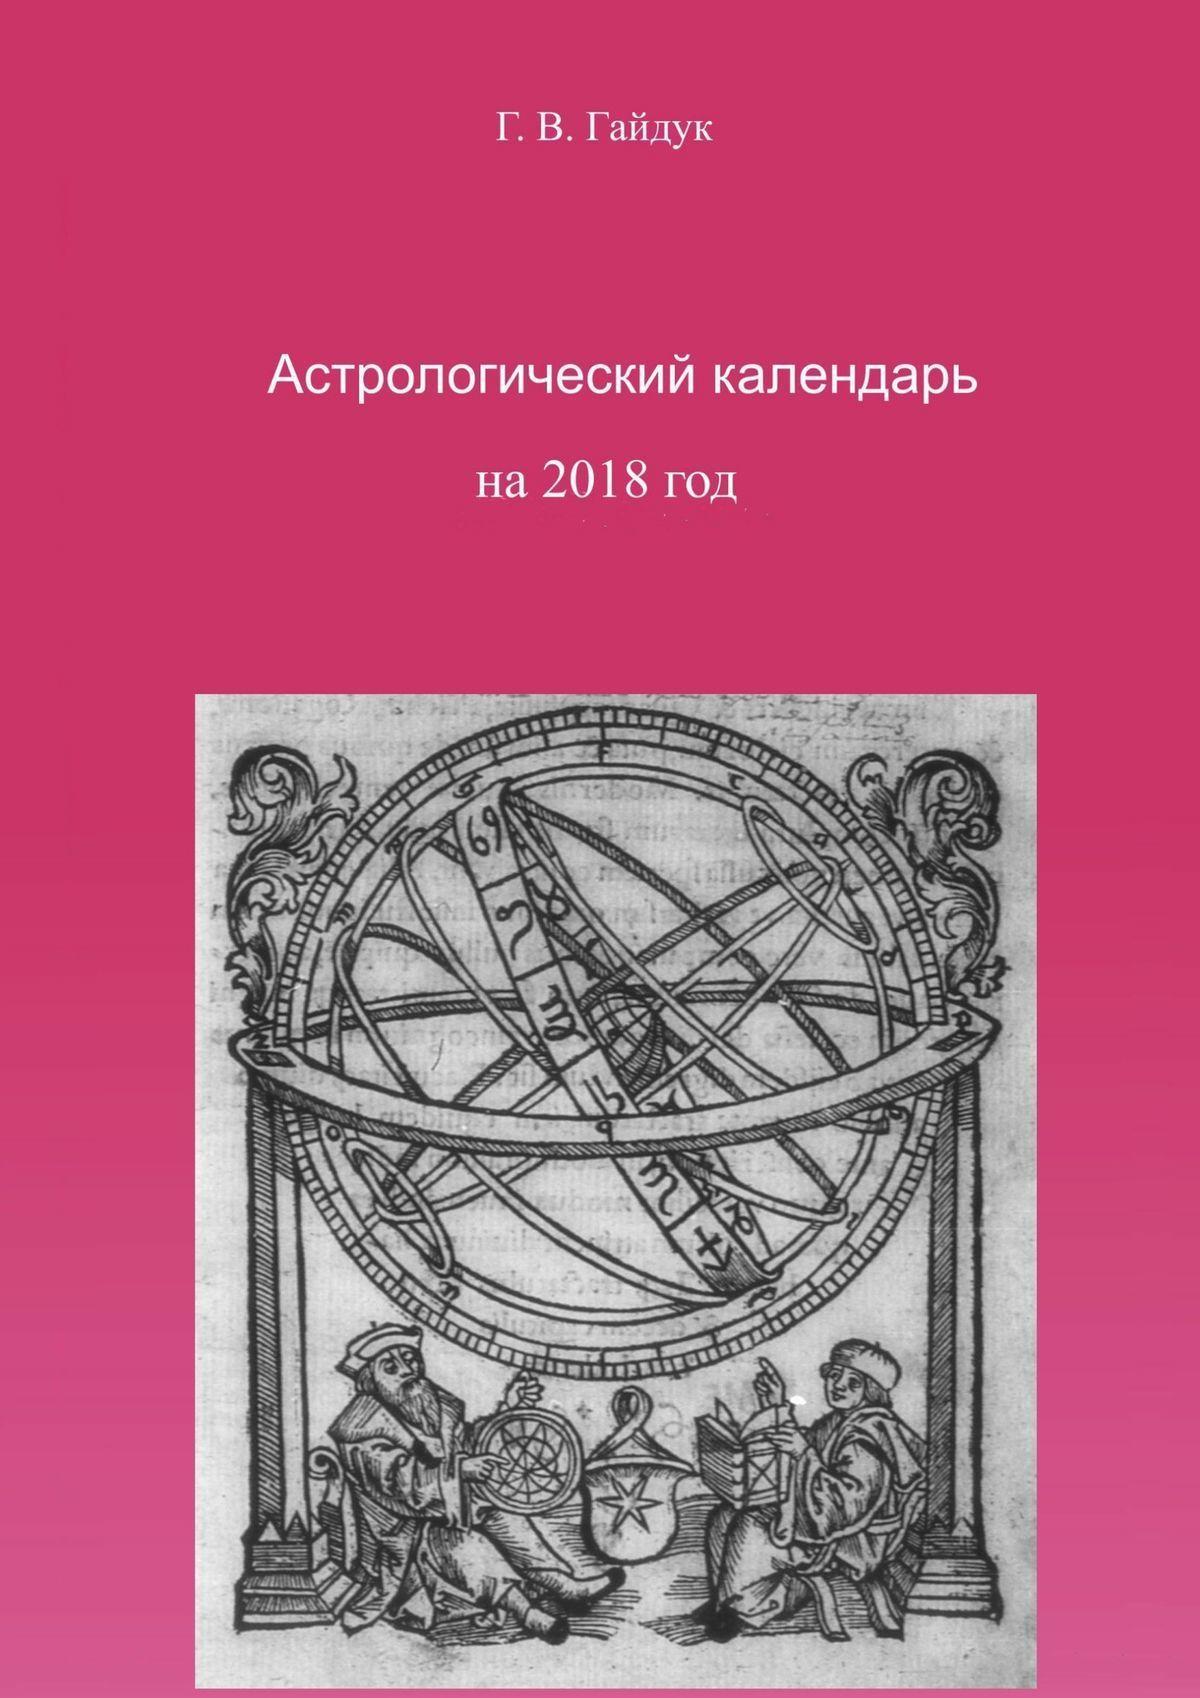 Галина Гайдук Астрологический календарь на 2018 год ISBN: 9785448545603 цена